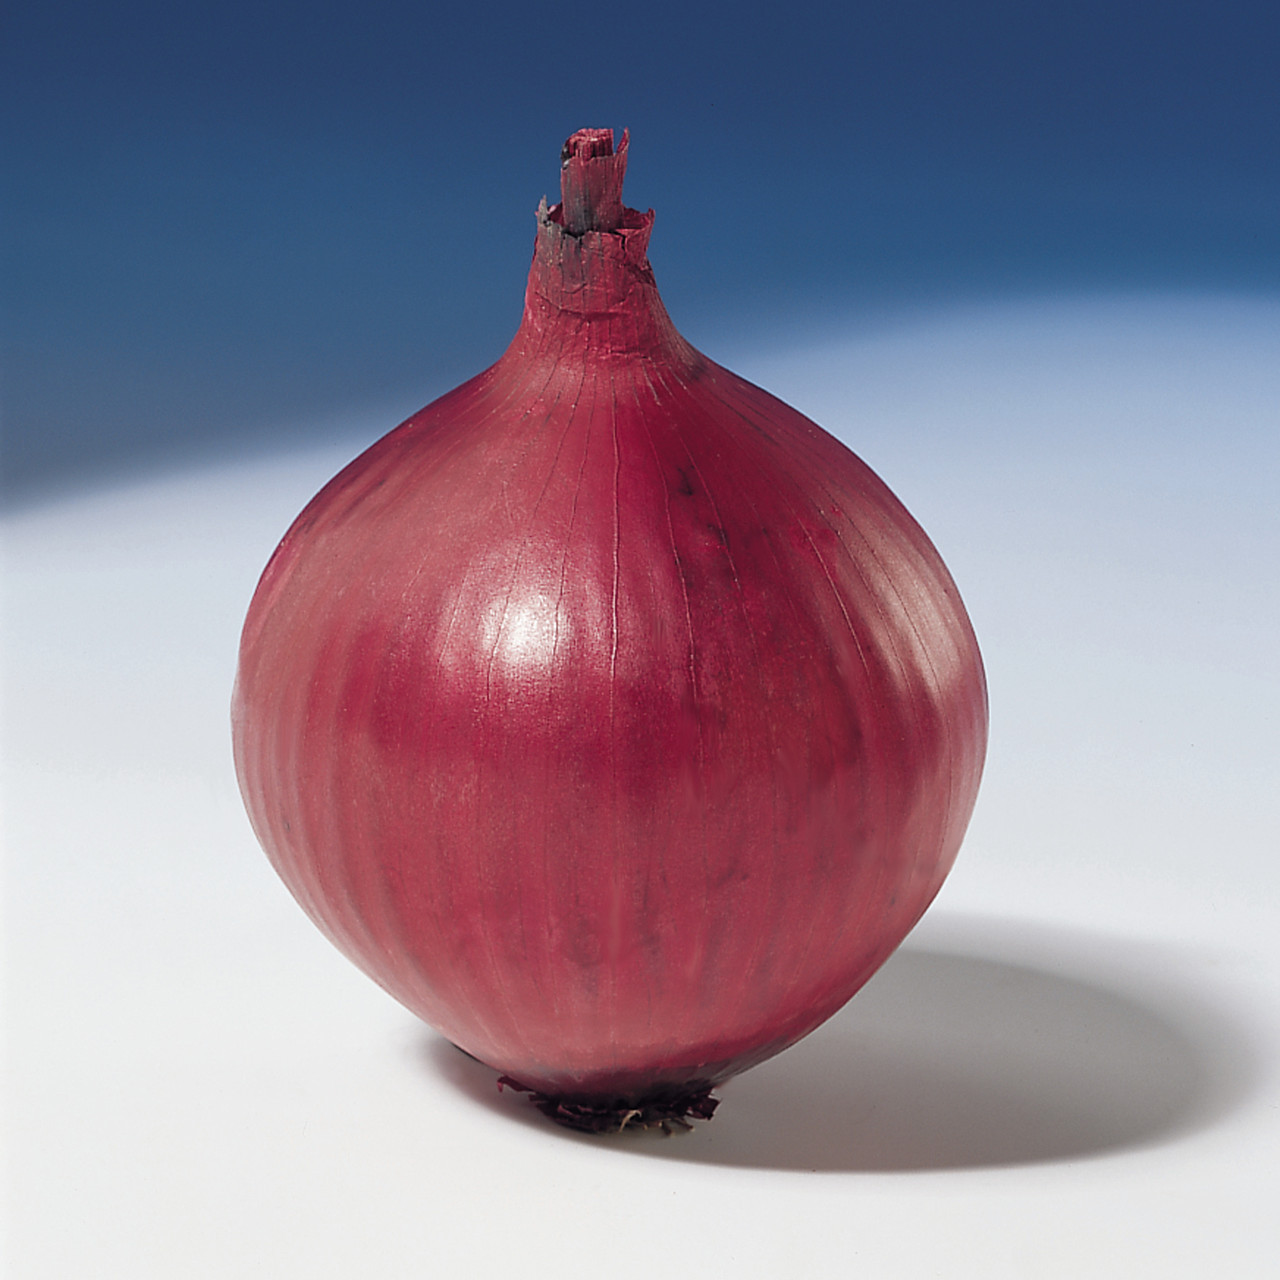 Семена красного лука Ред Барон \ Red Baron 250.000 семян  Bejo Zaden